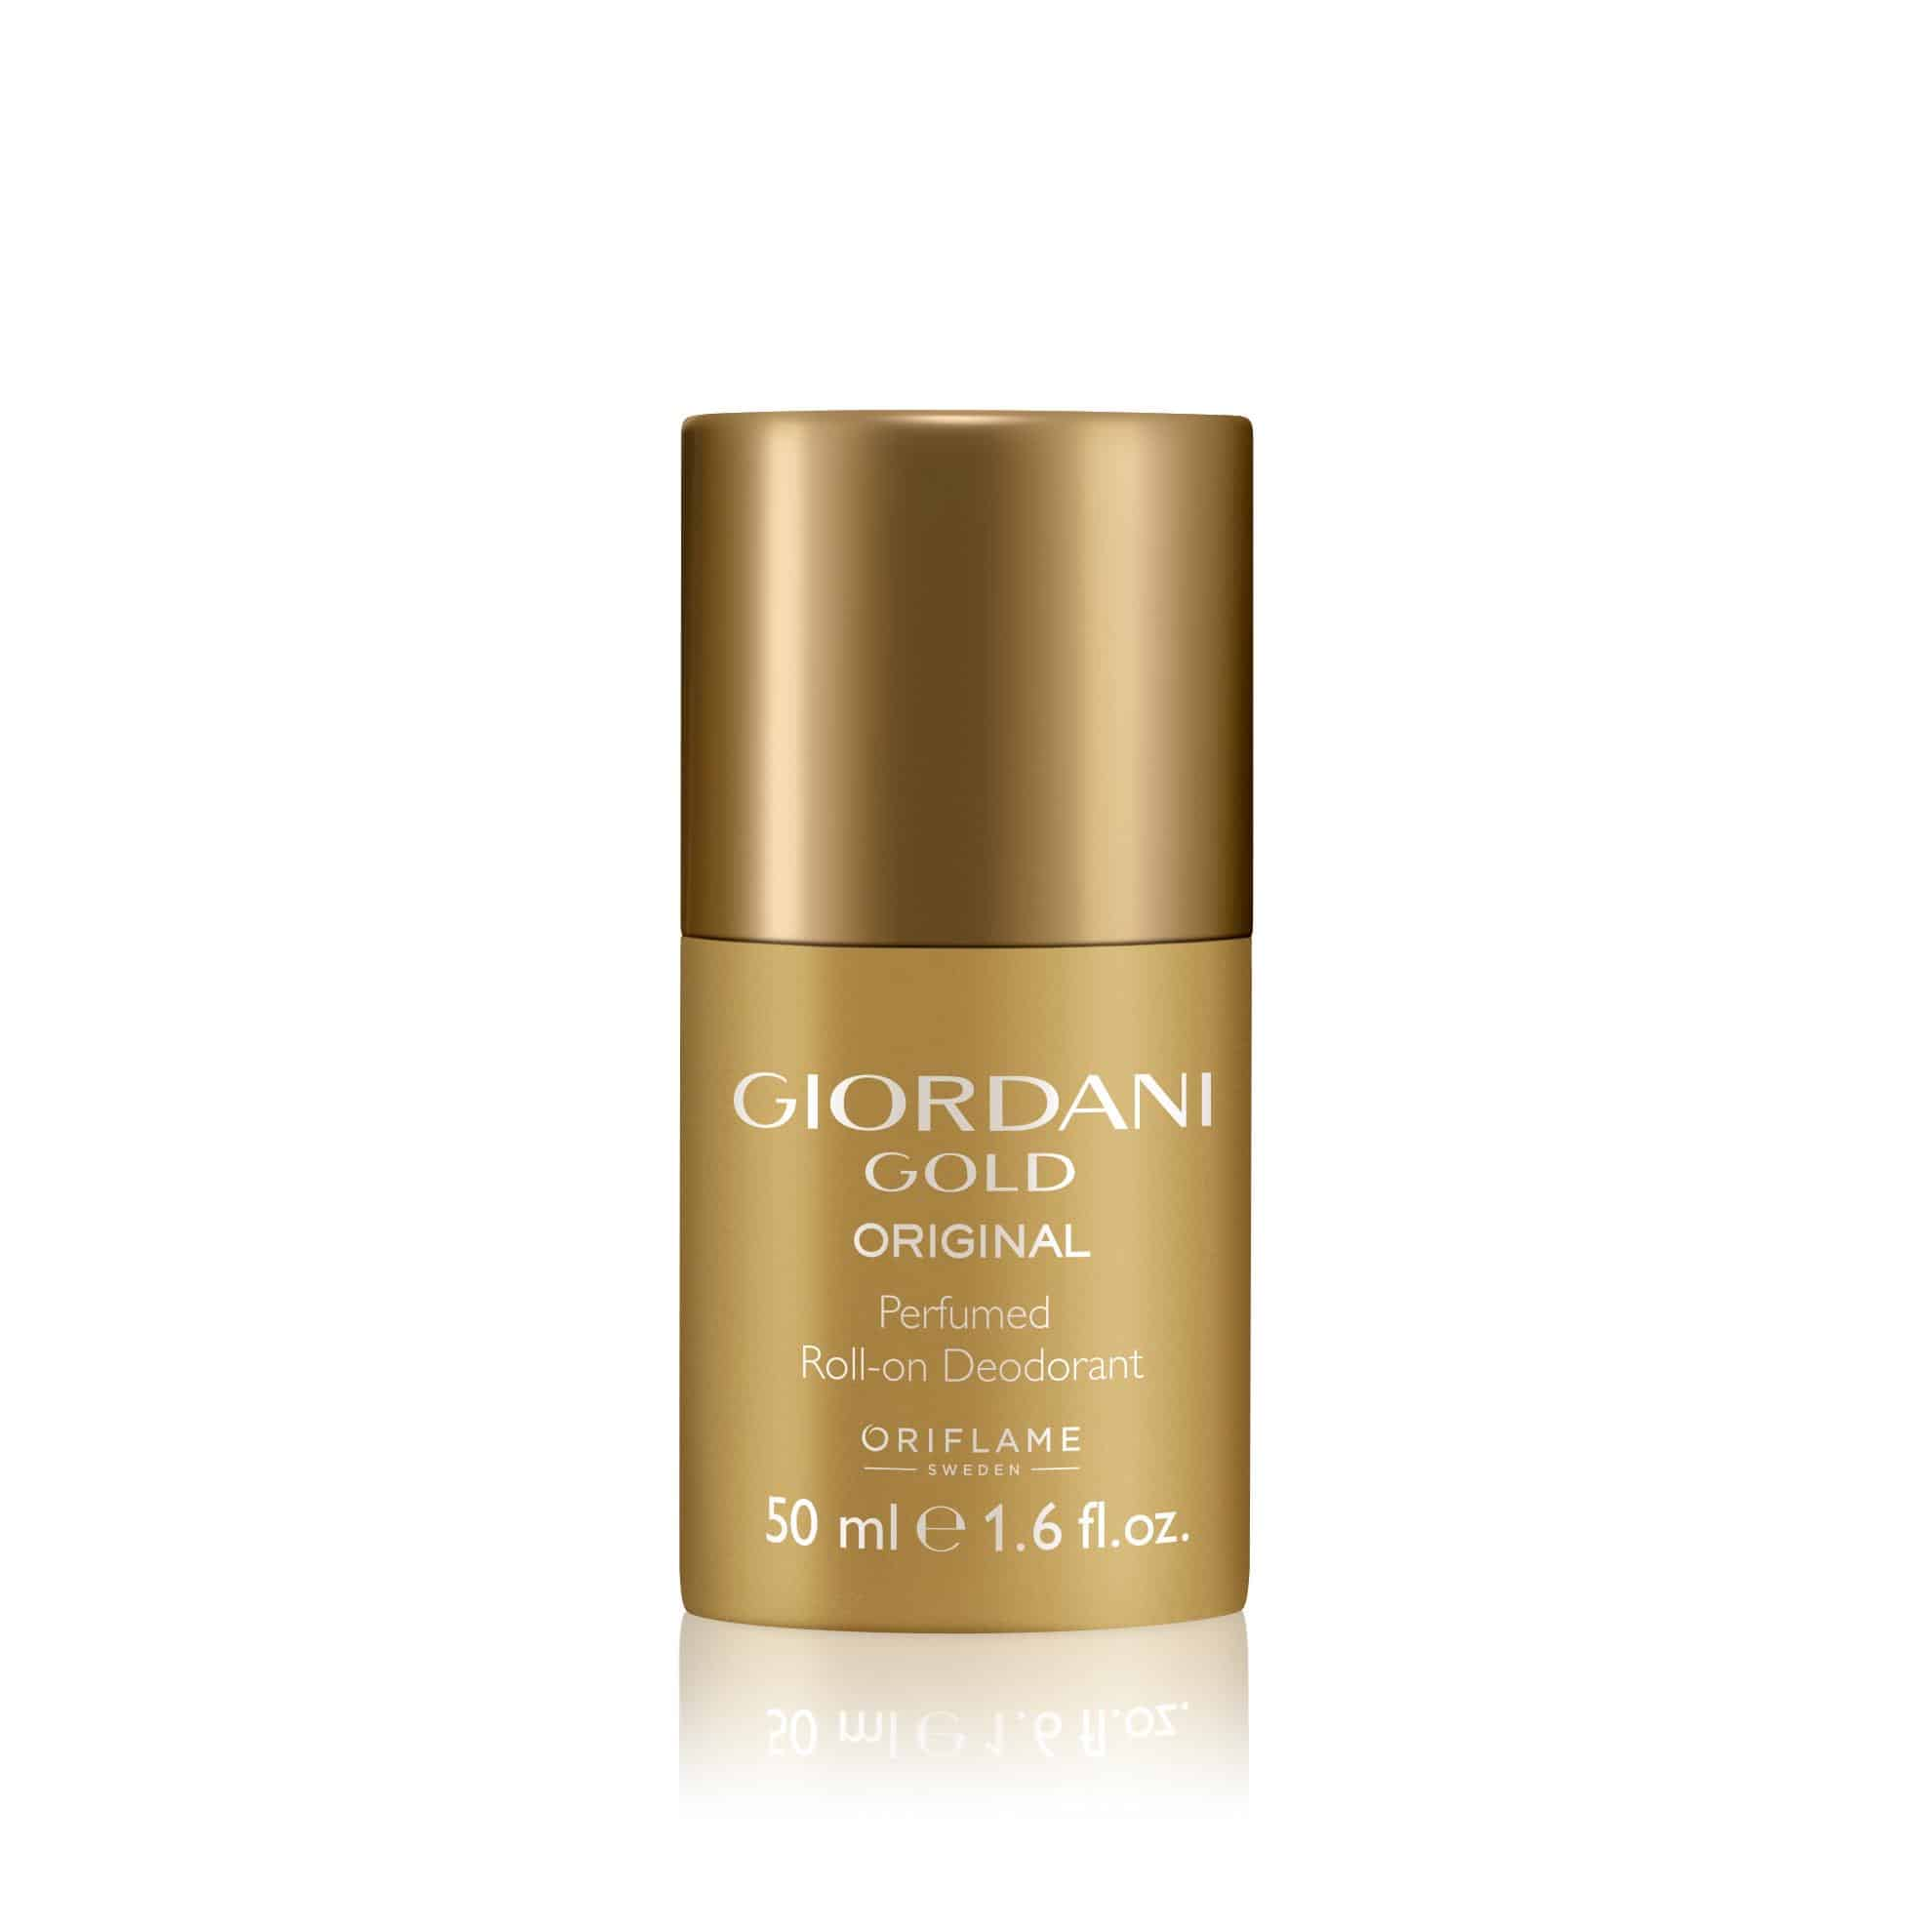 Deodorant-Oriflame-Giordani-Gold.